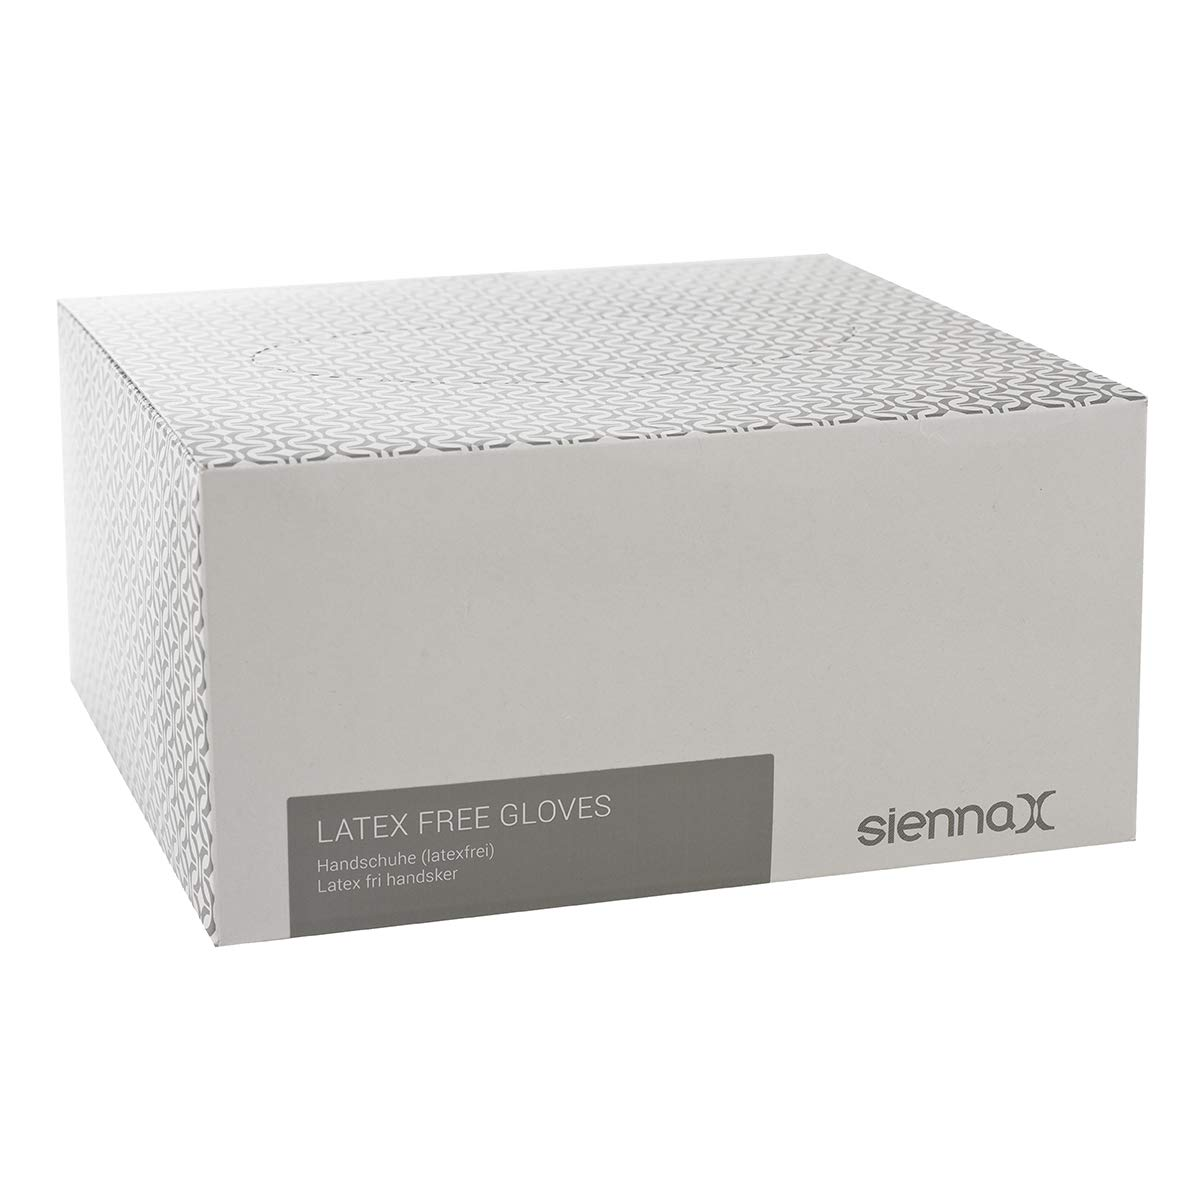 Sienna-x Gants jetables sans latex - 50 Pairs GLOVESLATEXFREEX50PAIRS